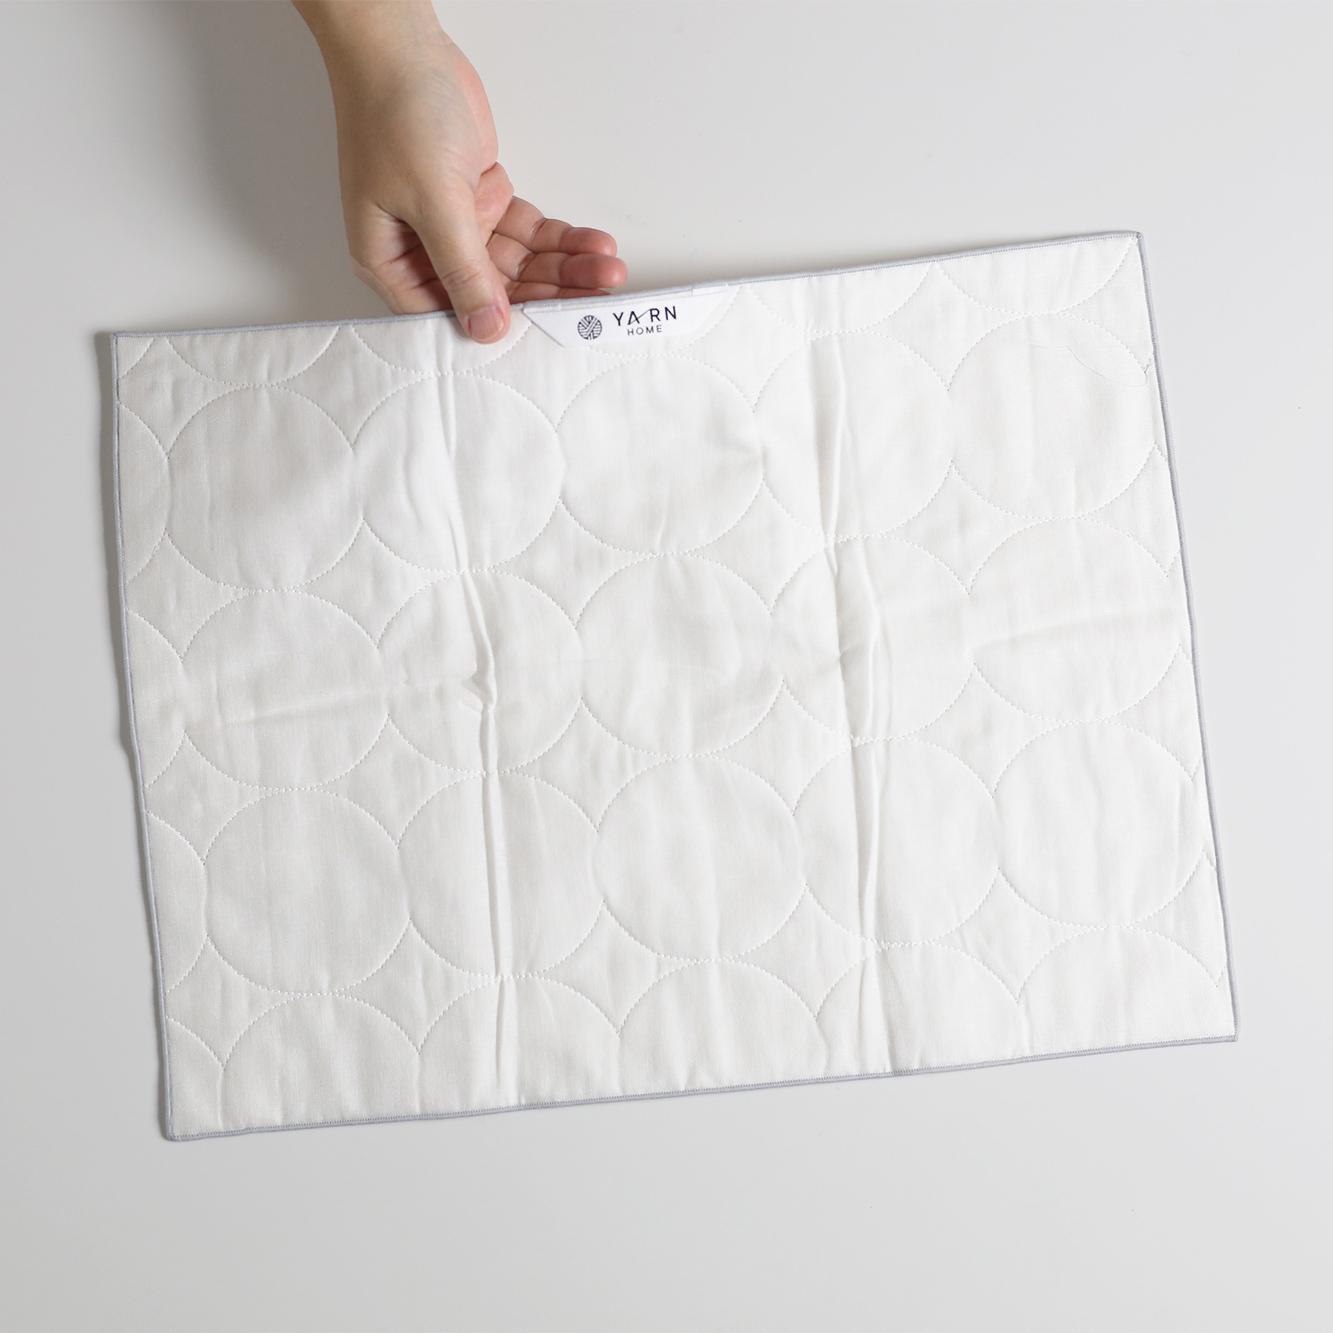 Kitchen towel M size / ふきん M